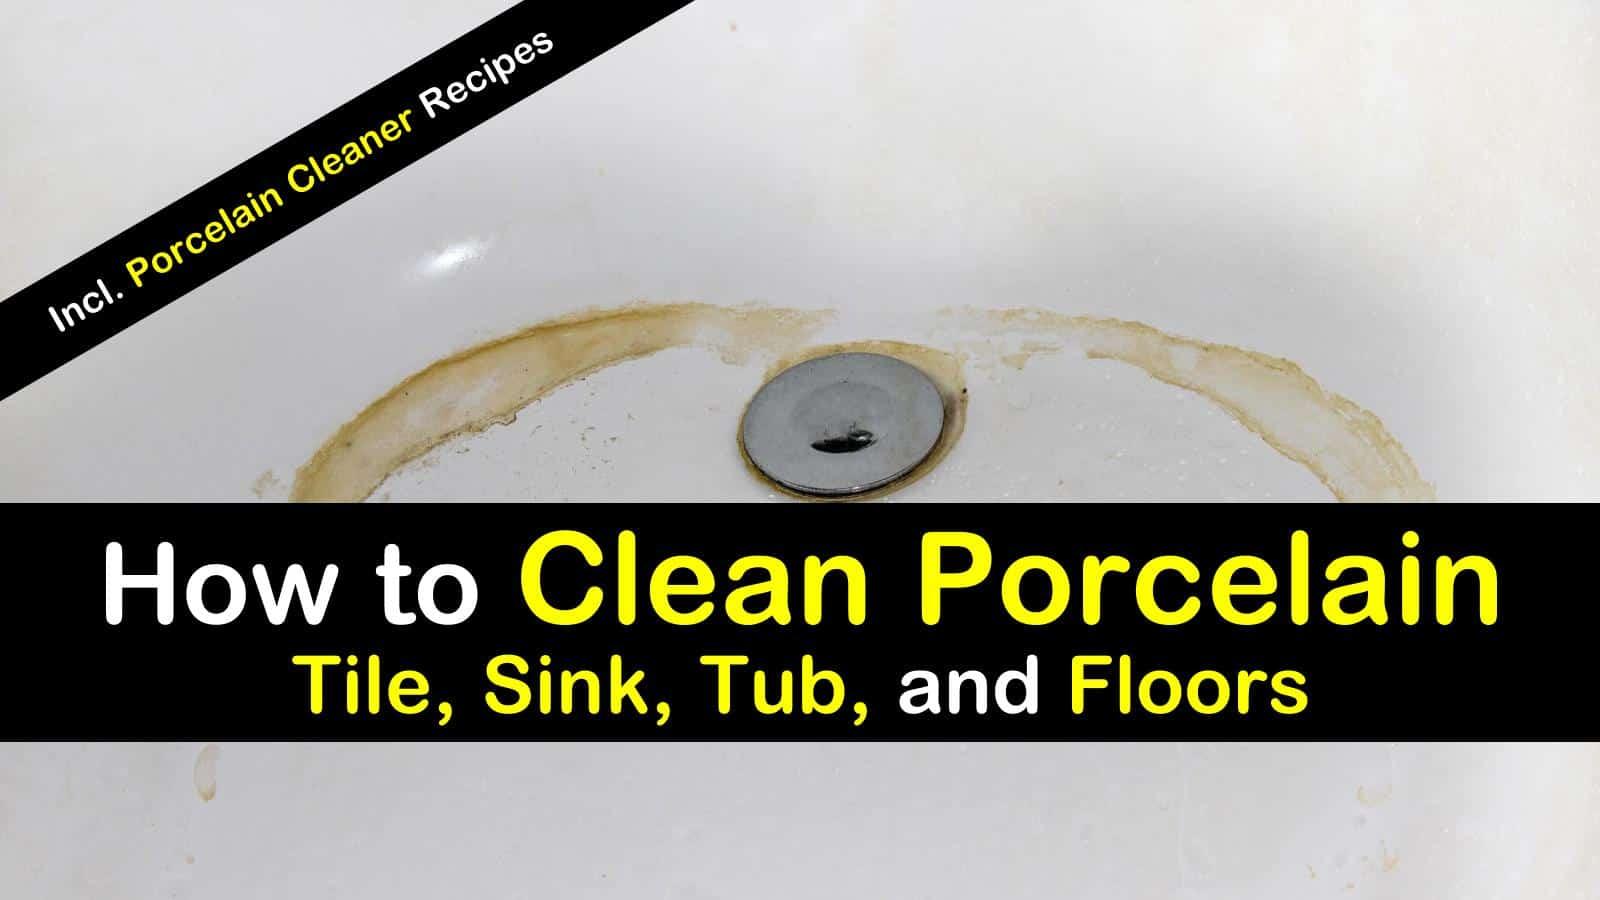 12 ideal ways to clean porcelain tile